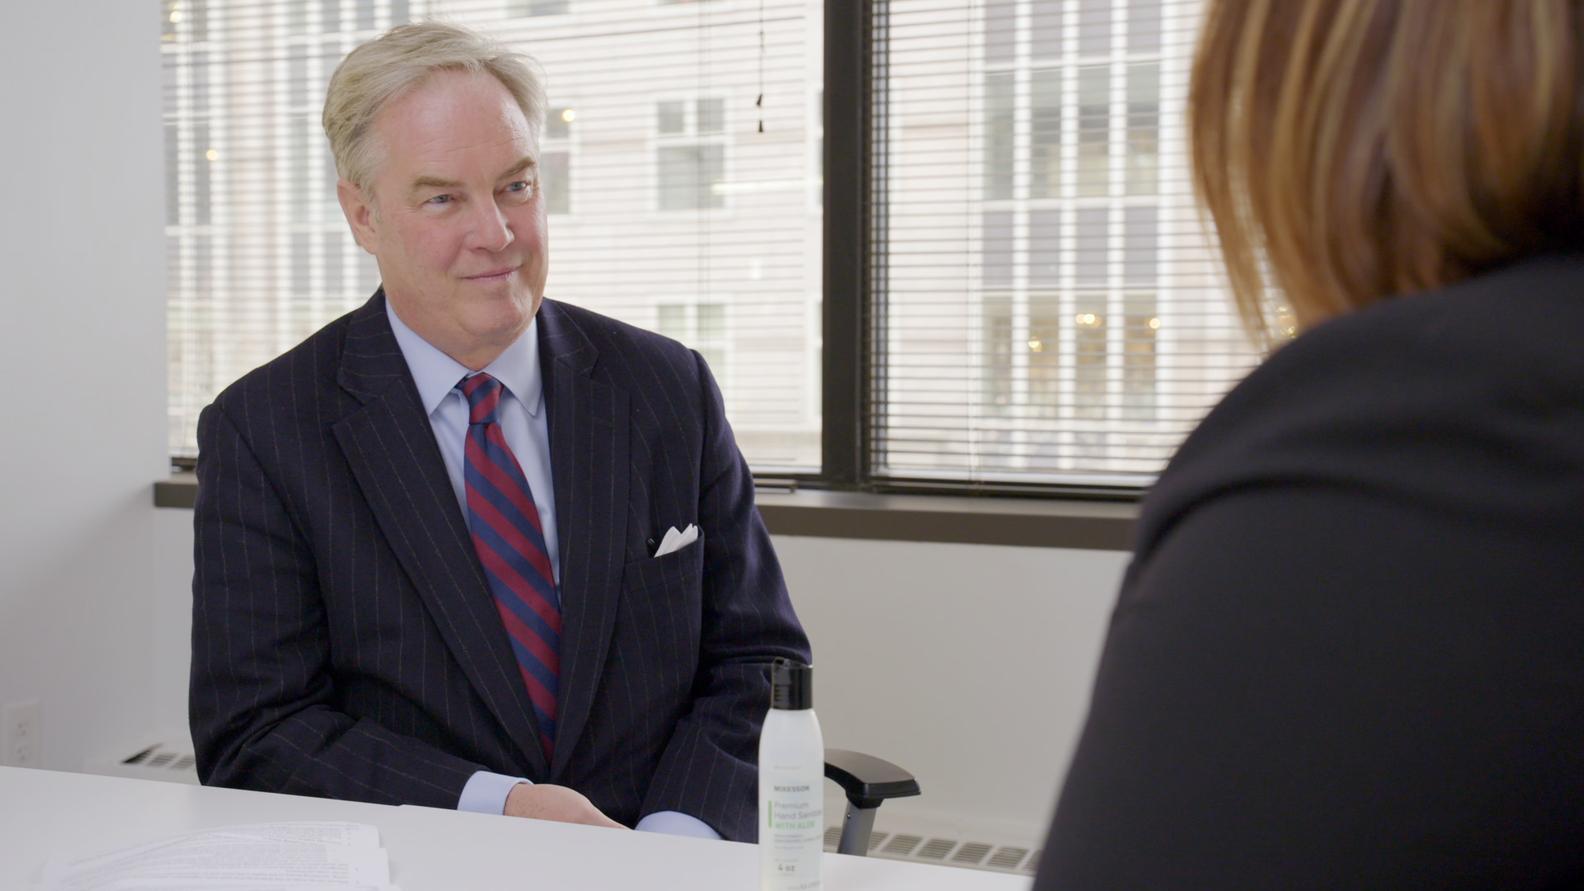 Trevor Potter, Founder & President, Campaign Legal Center